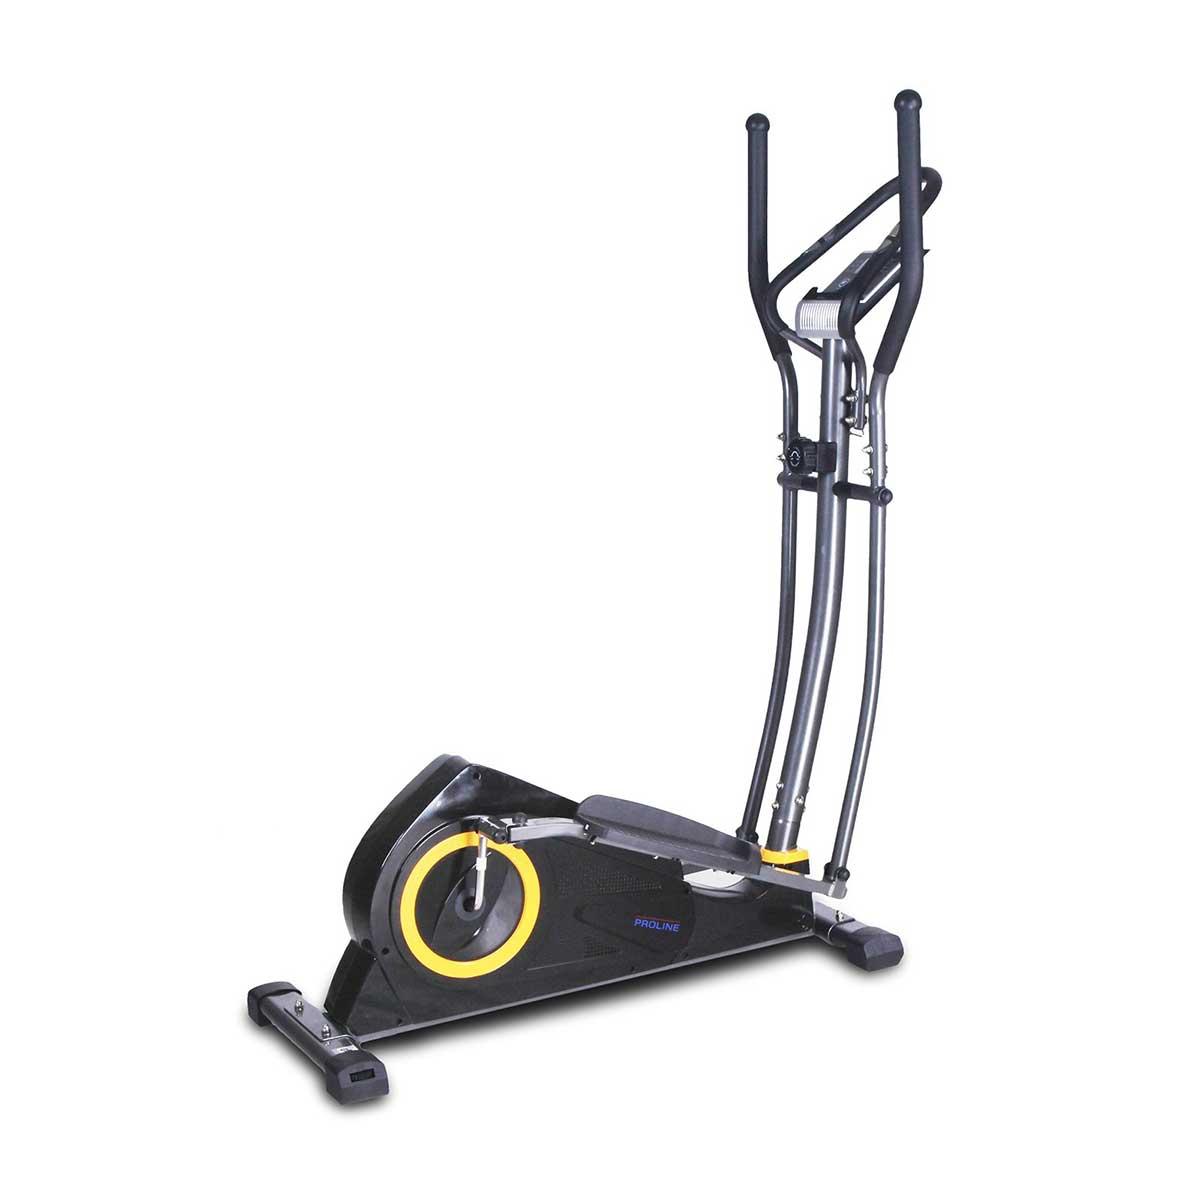 Buy Proline Fitness EFIT 335E Elliptical Trainer Online India